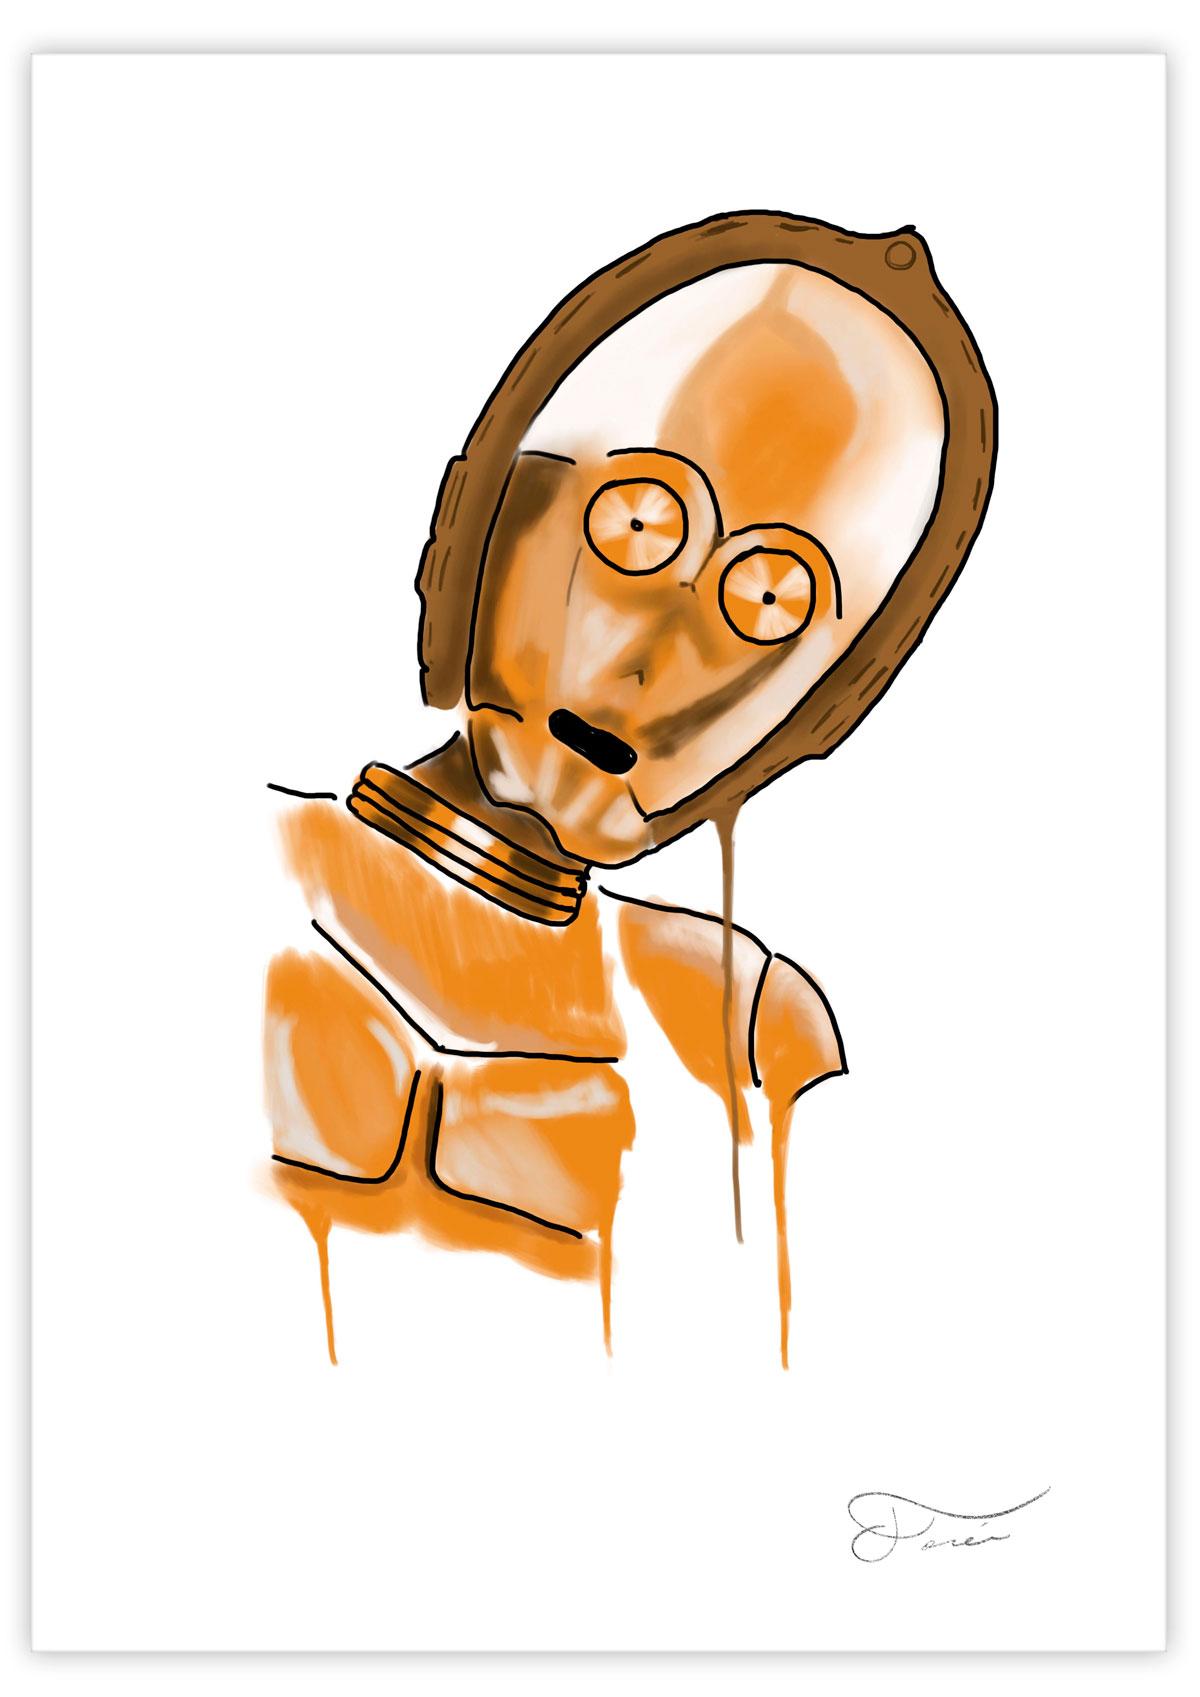 C-3PO Carlos Forcen Ilustracion